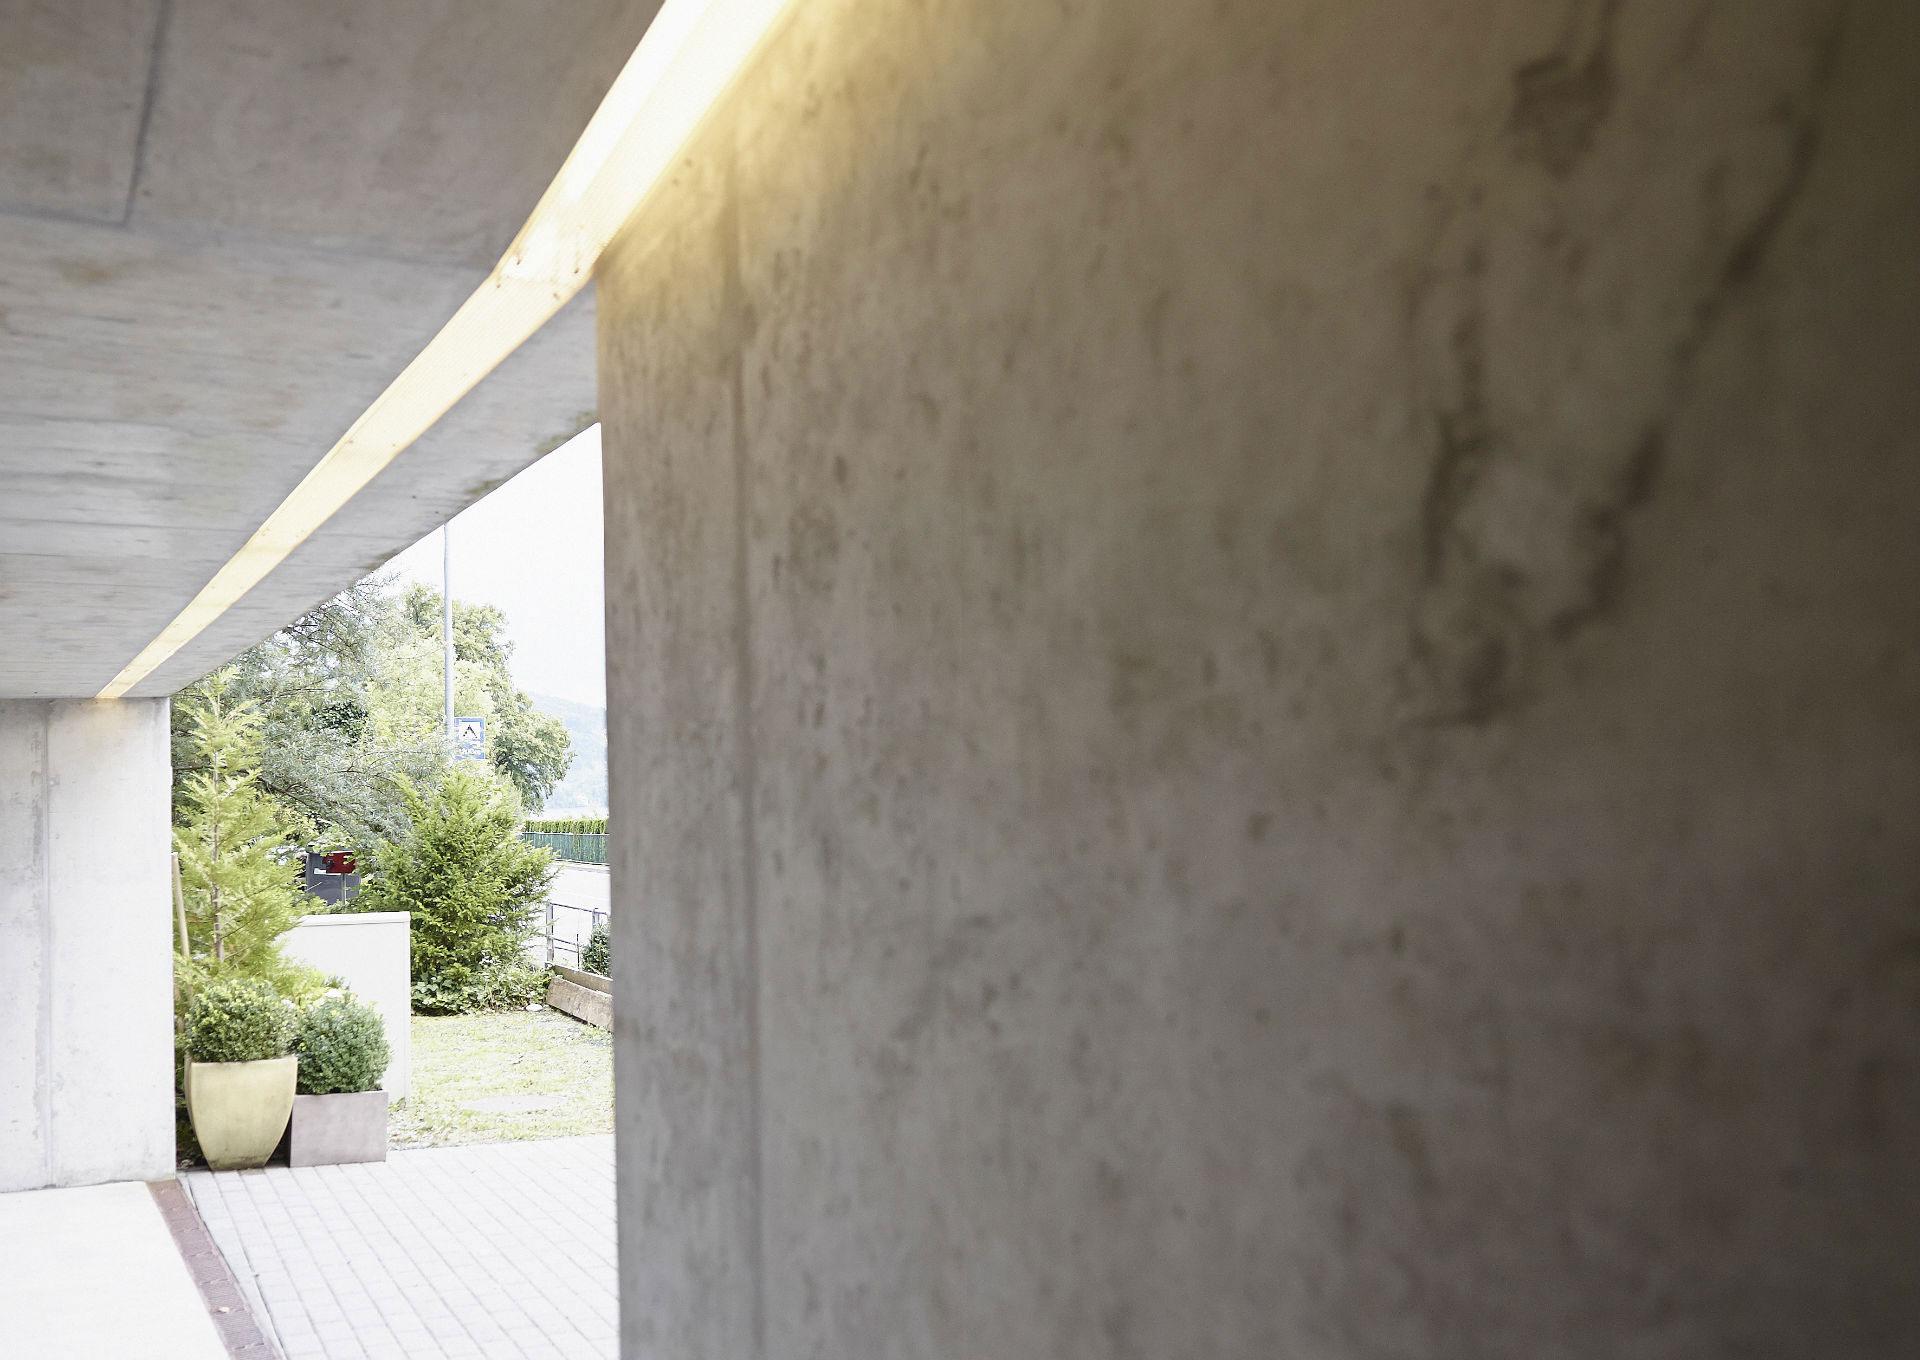 mondrianHouse-lakesidedevelopment-lsd-swiss-12-2